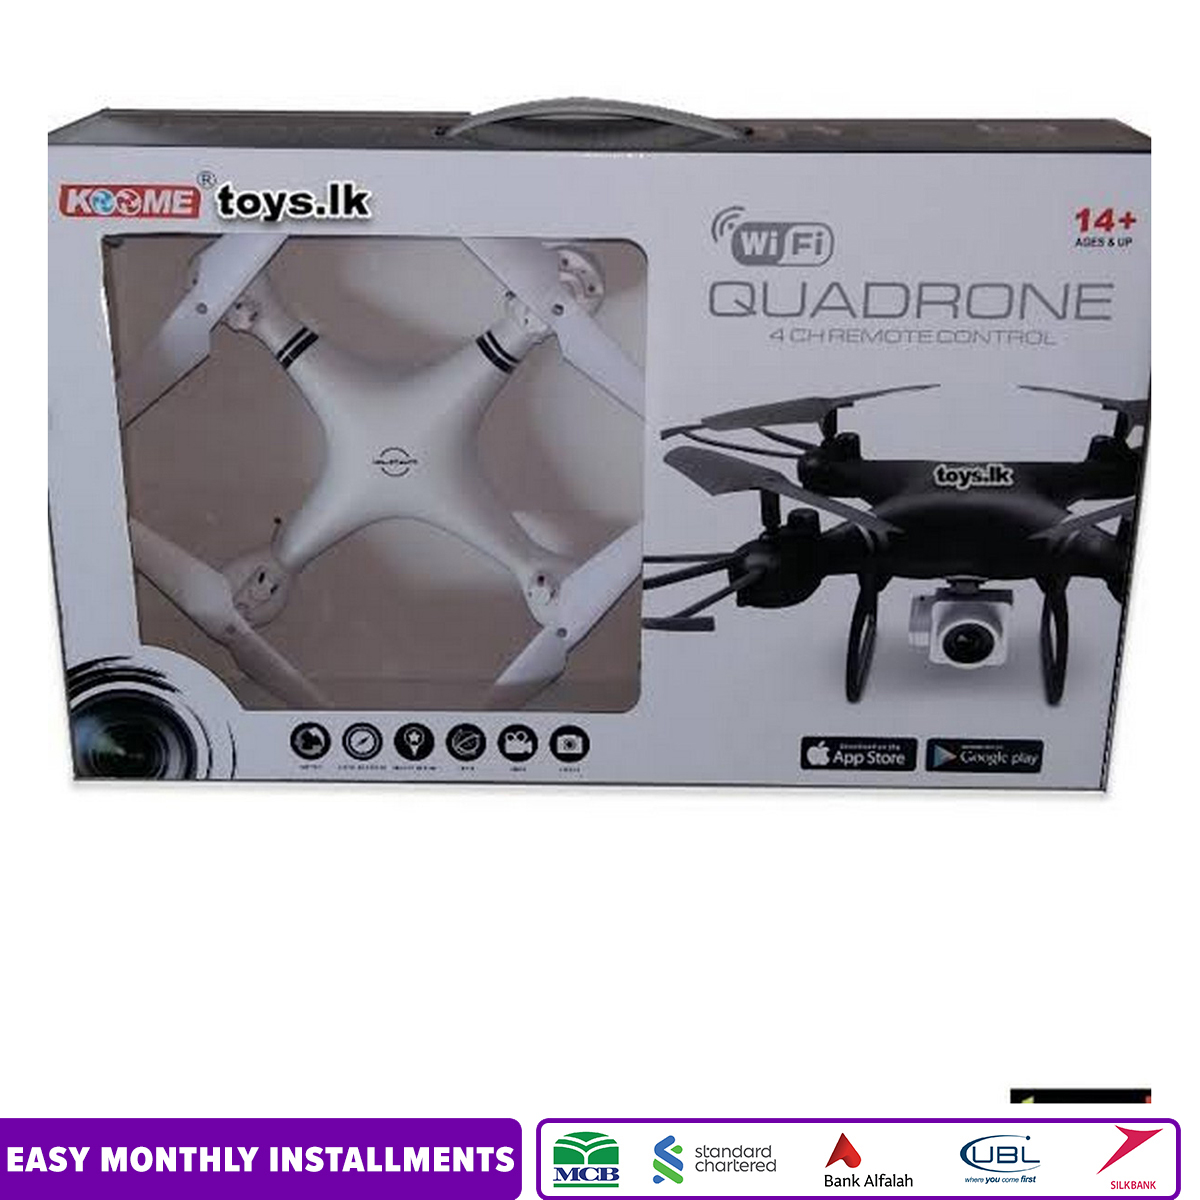 Koome K3c headless quad drone